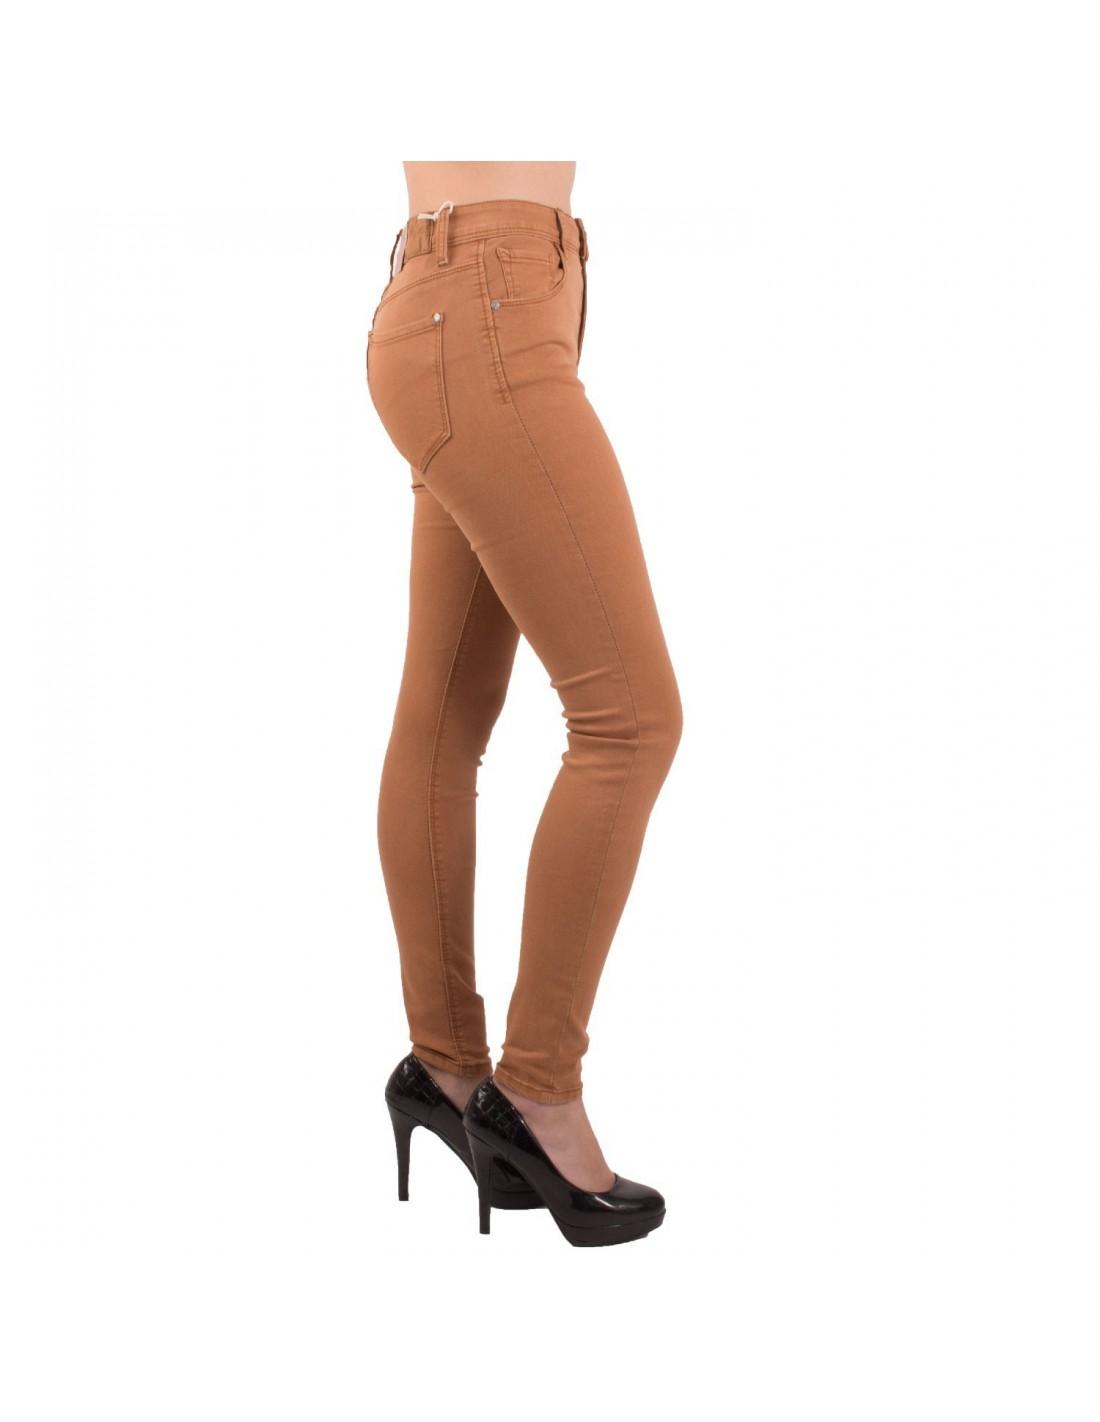 Jean femme slim camel taille haute coupe stretch marron